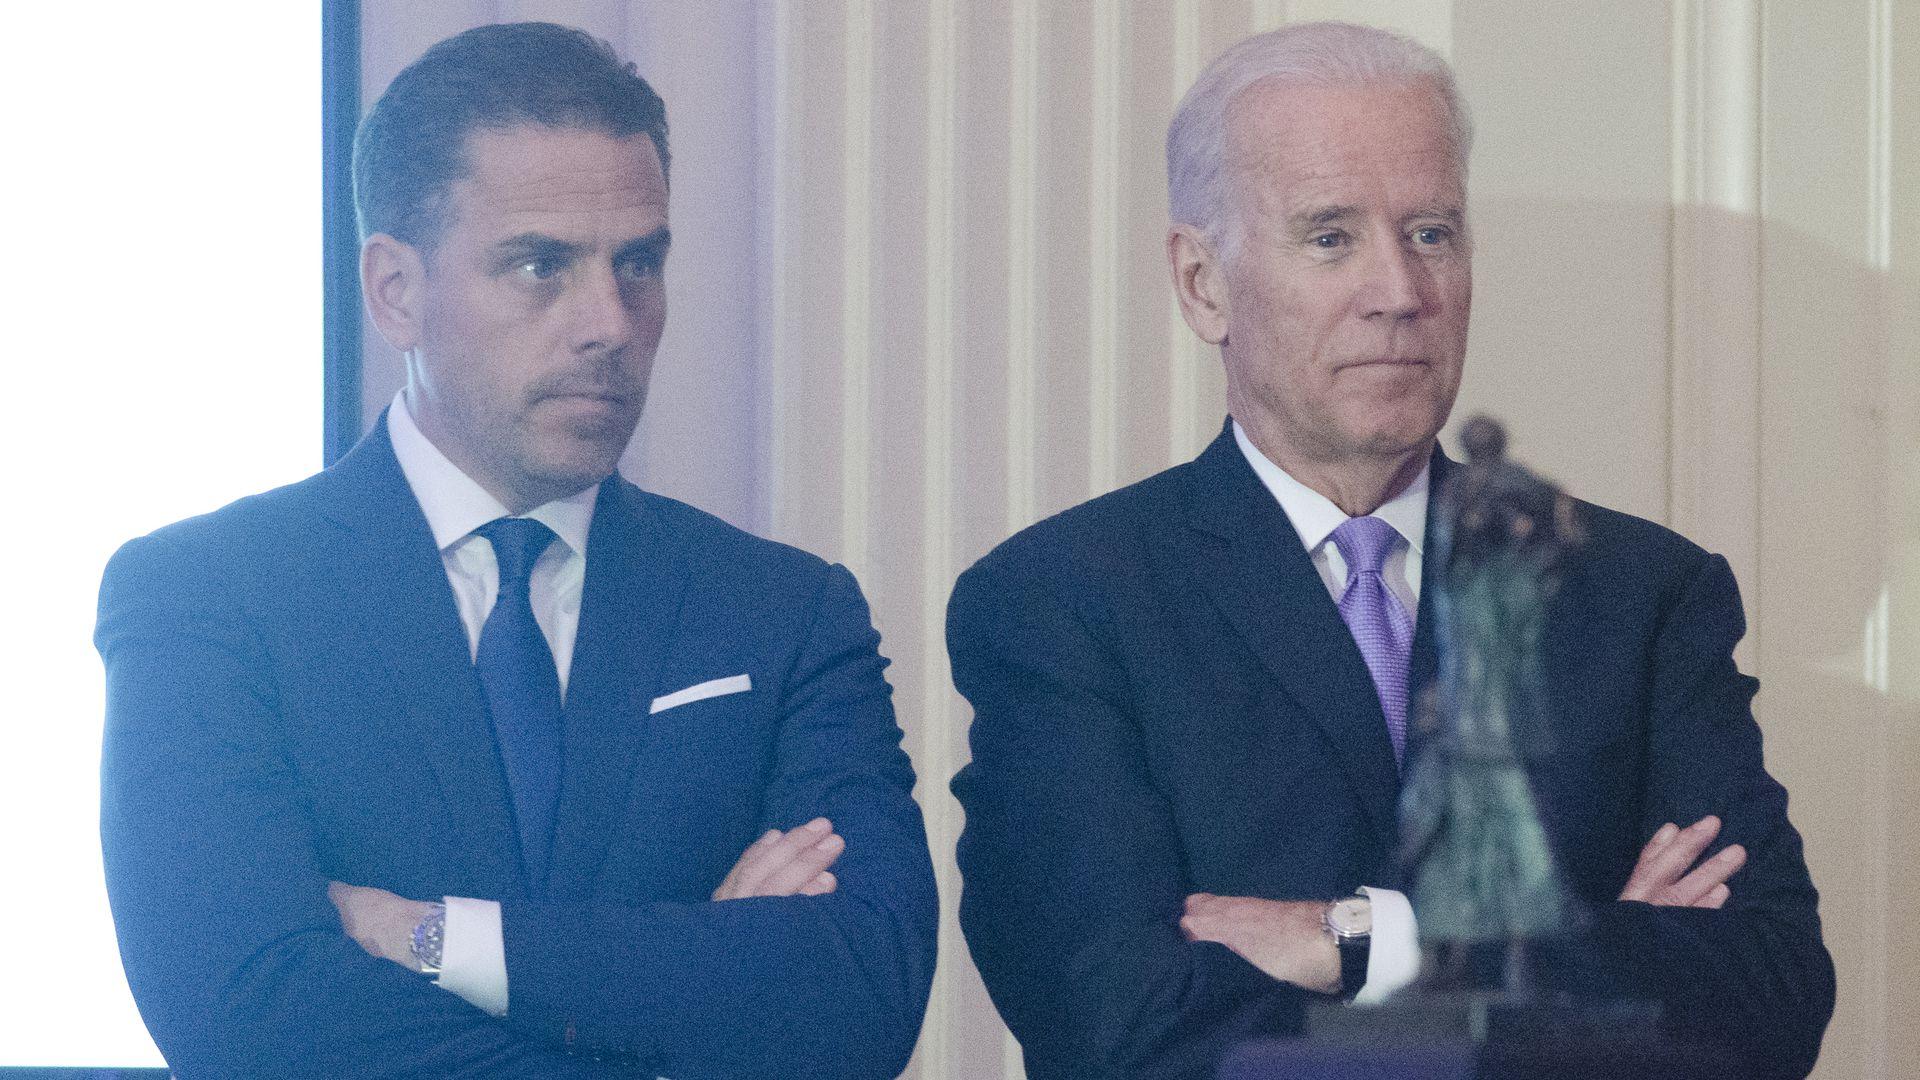 Hunter Biden S Hard Drive Links Joe Biden To Foreign Lobbying Operations